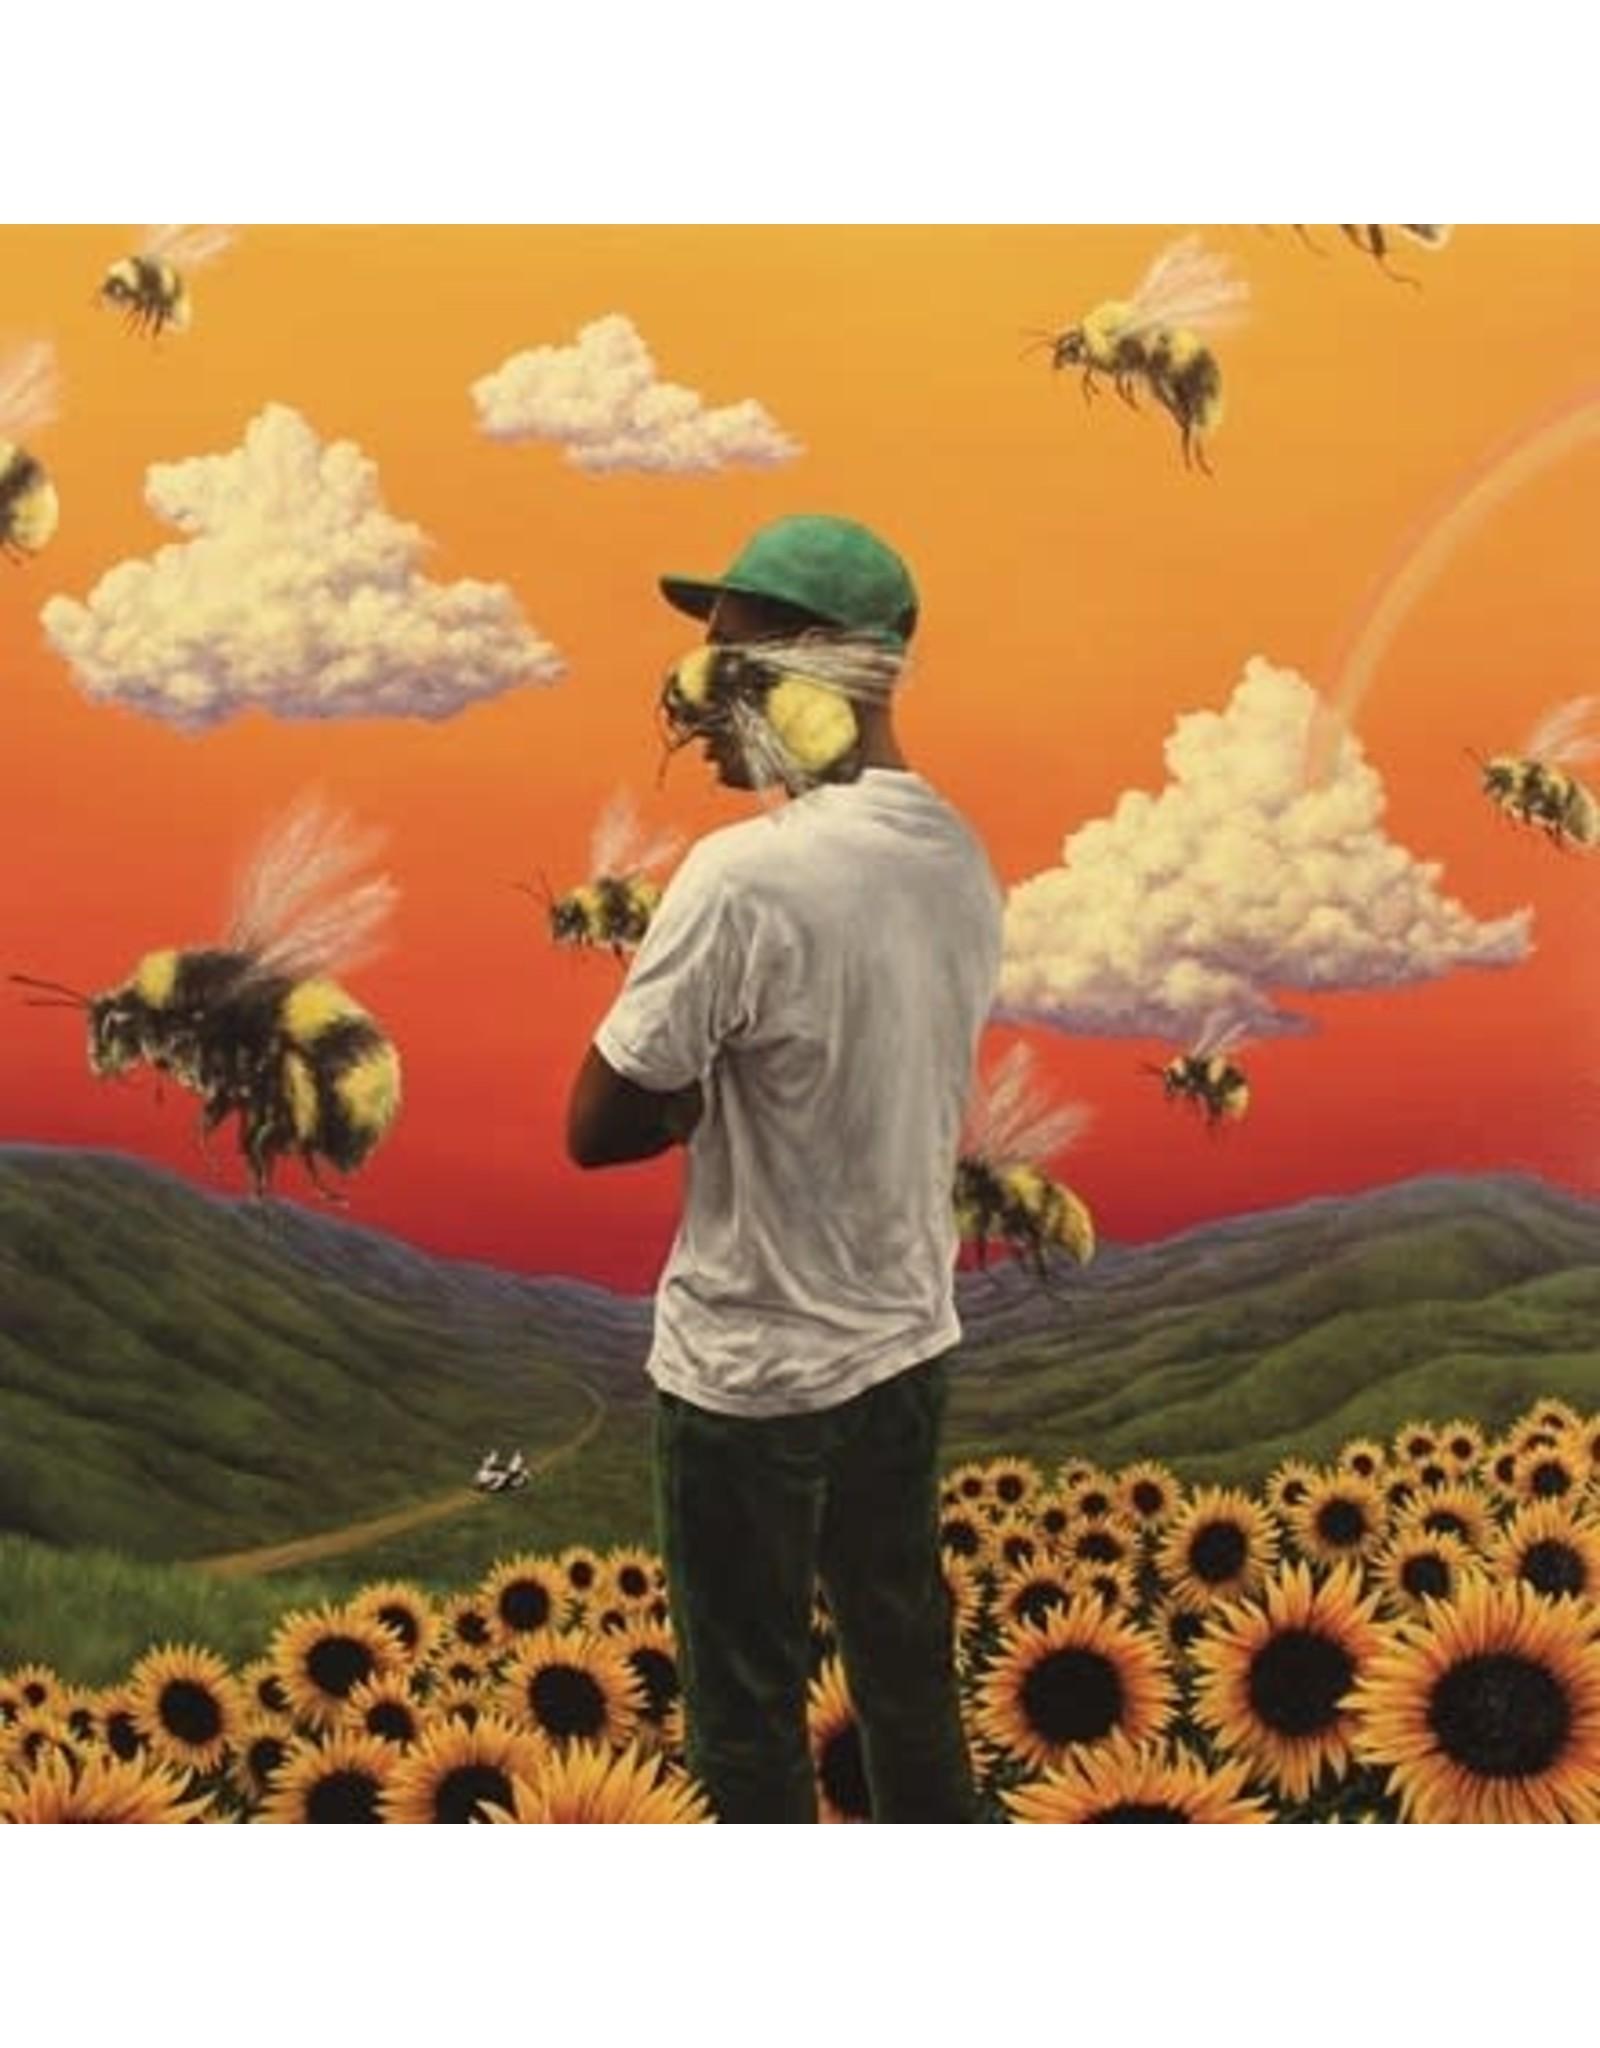 Columbia Tyler, The Creator: Flower Boy LP